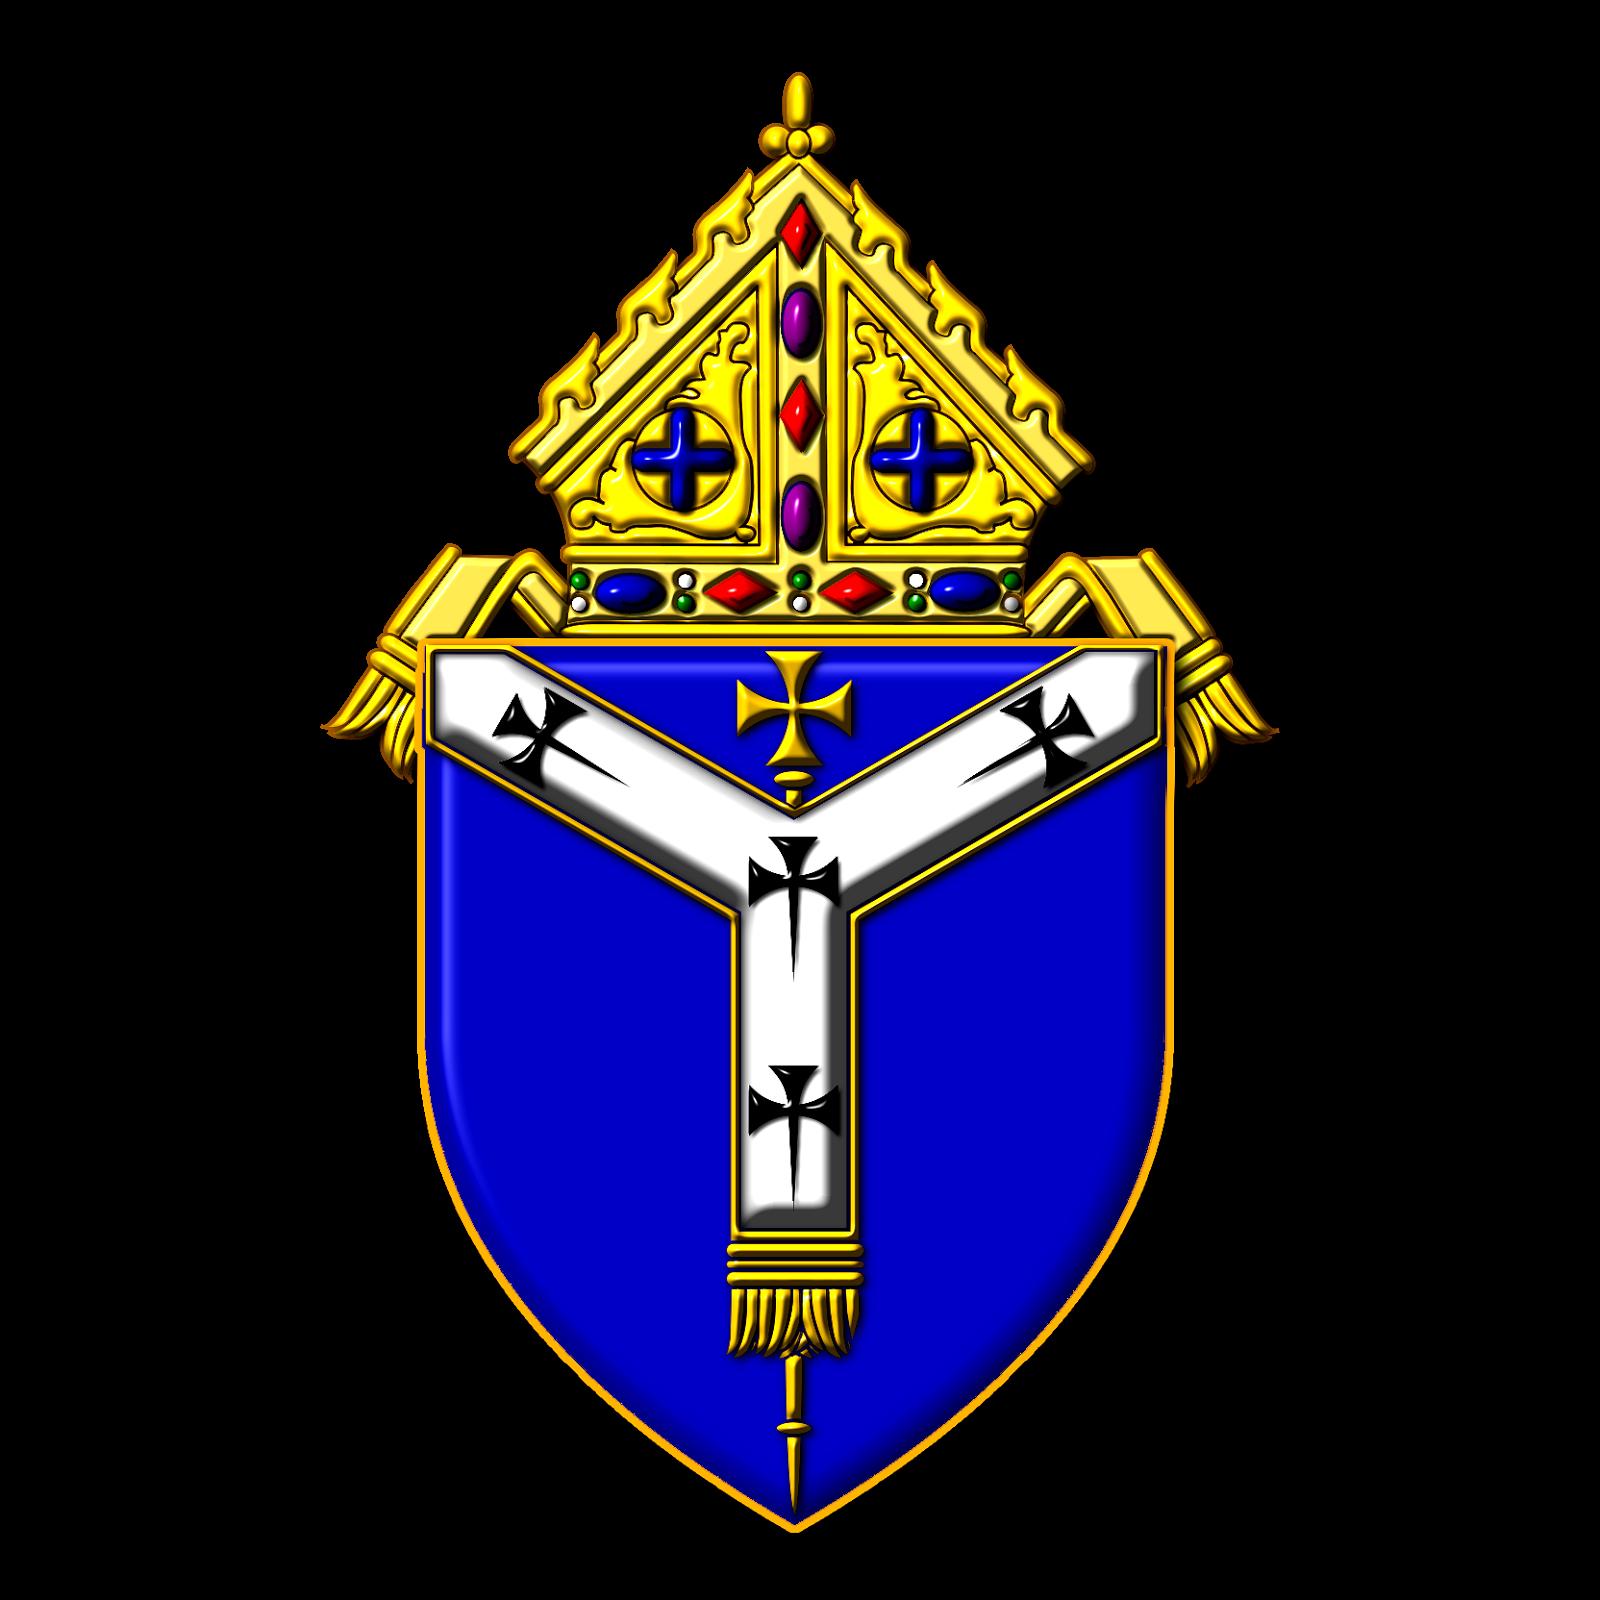 The art of heraldry ecclesiastical heraldry ecclesiastical heraldry biocorpaavc